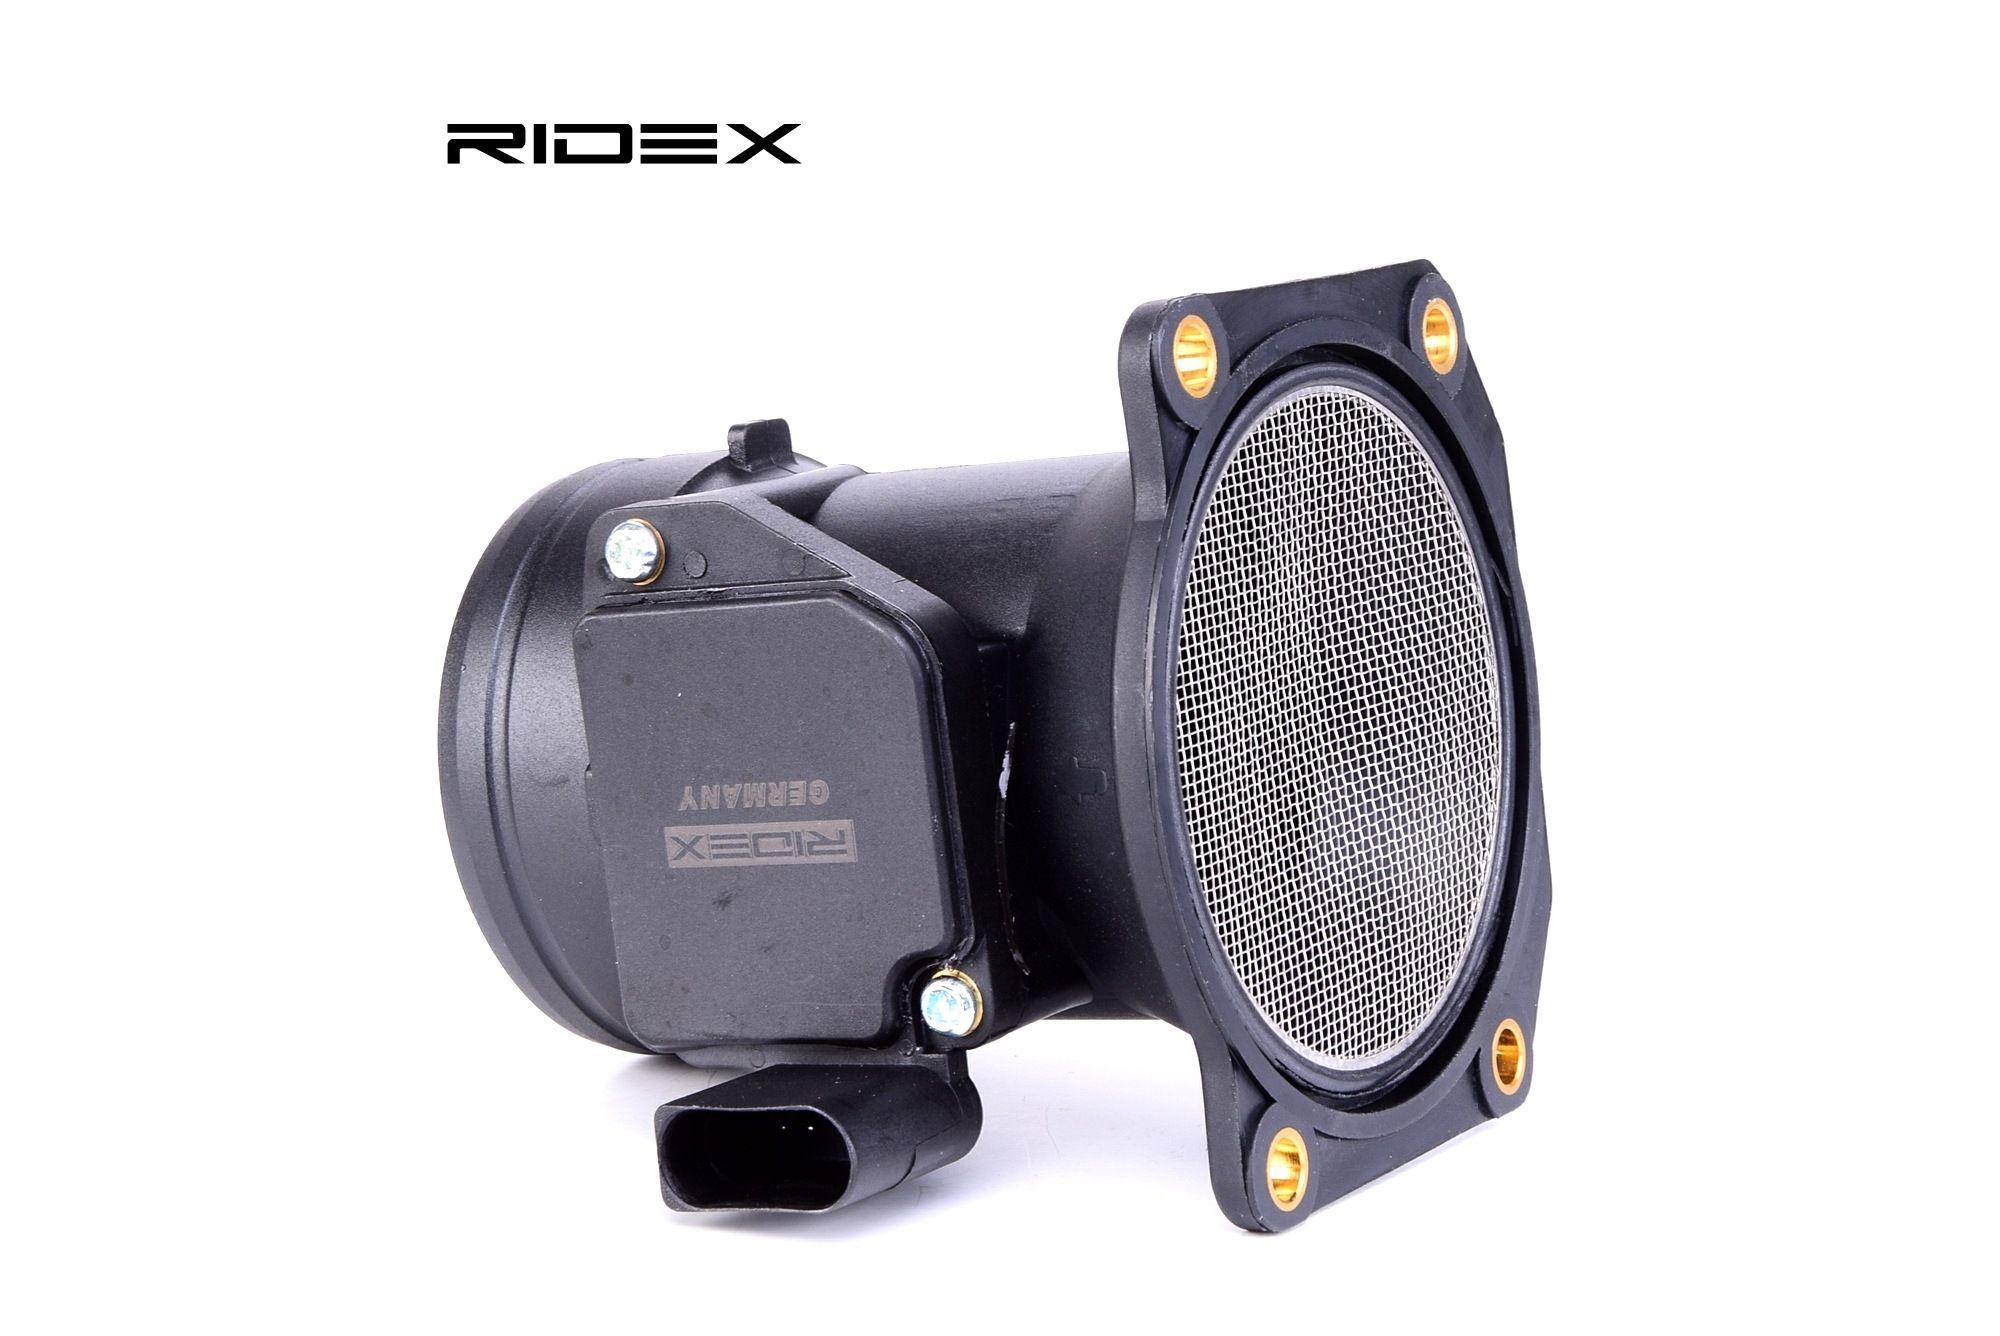 Lmm RIDEX 3926A0013